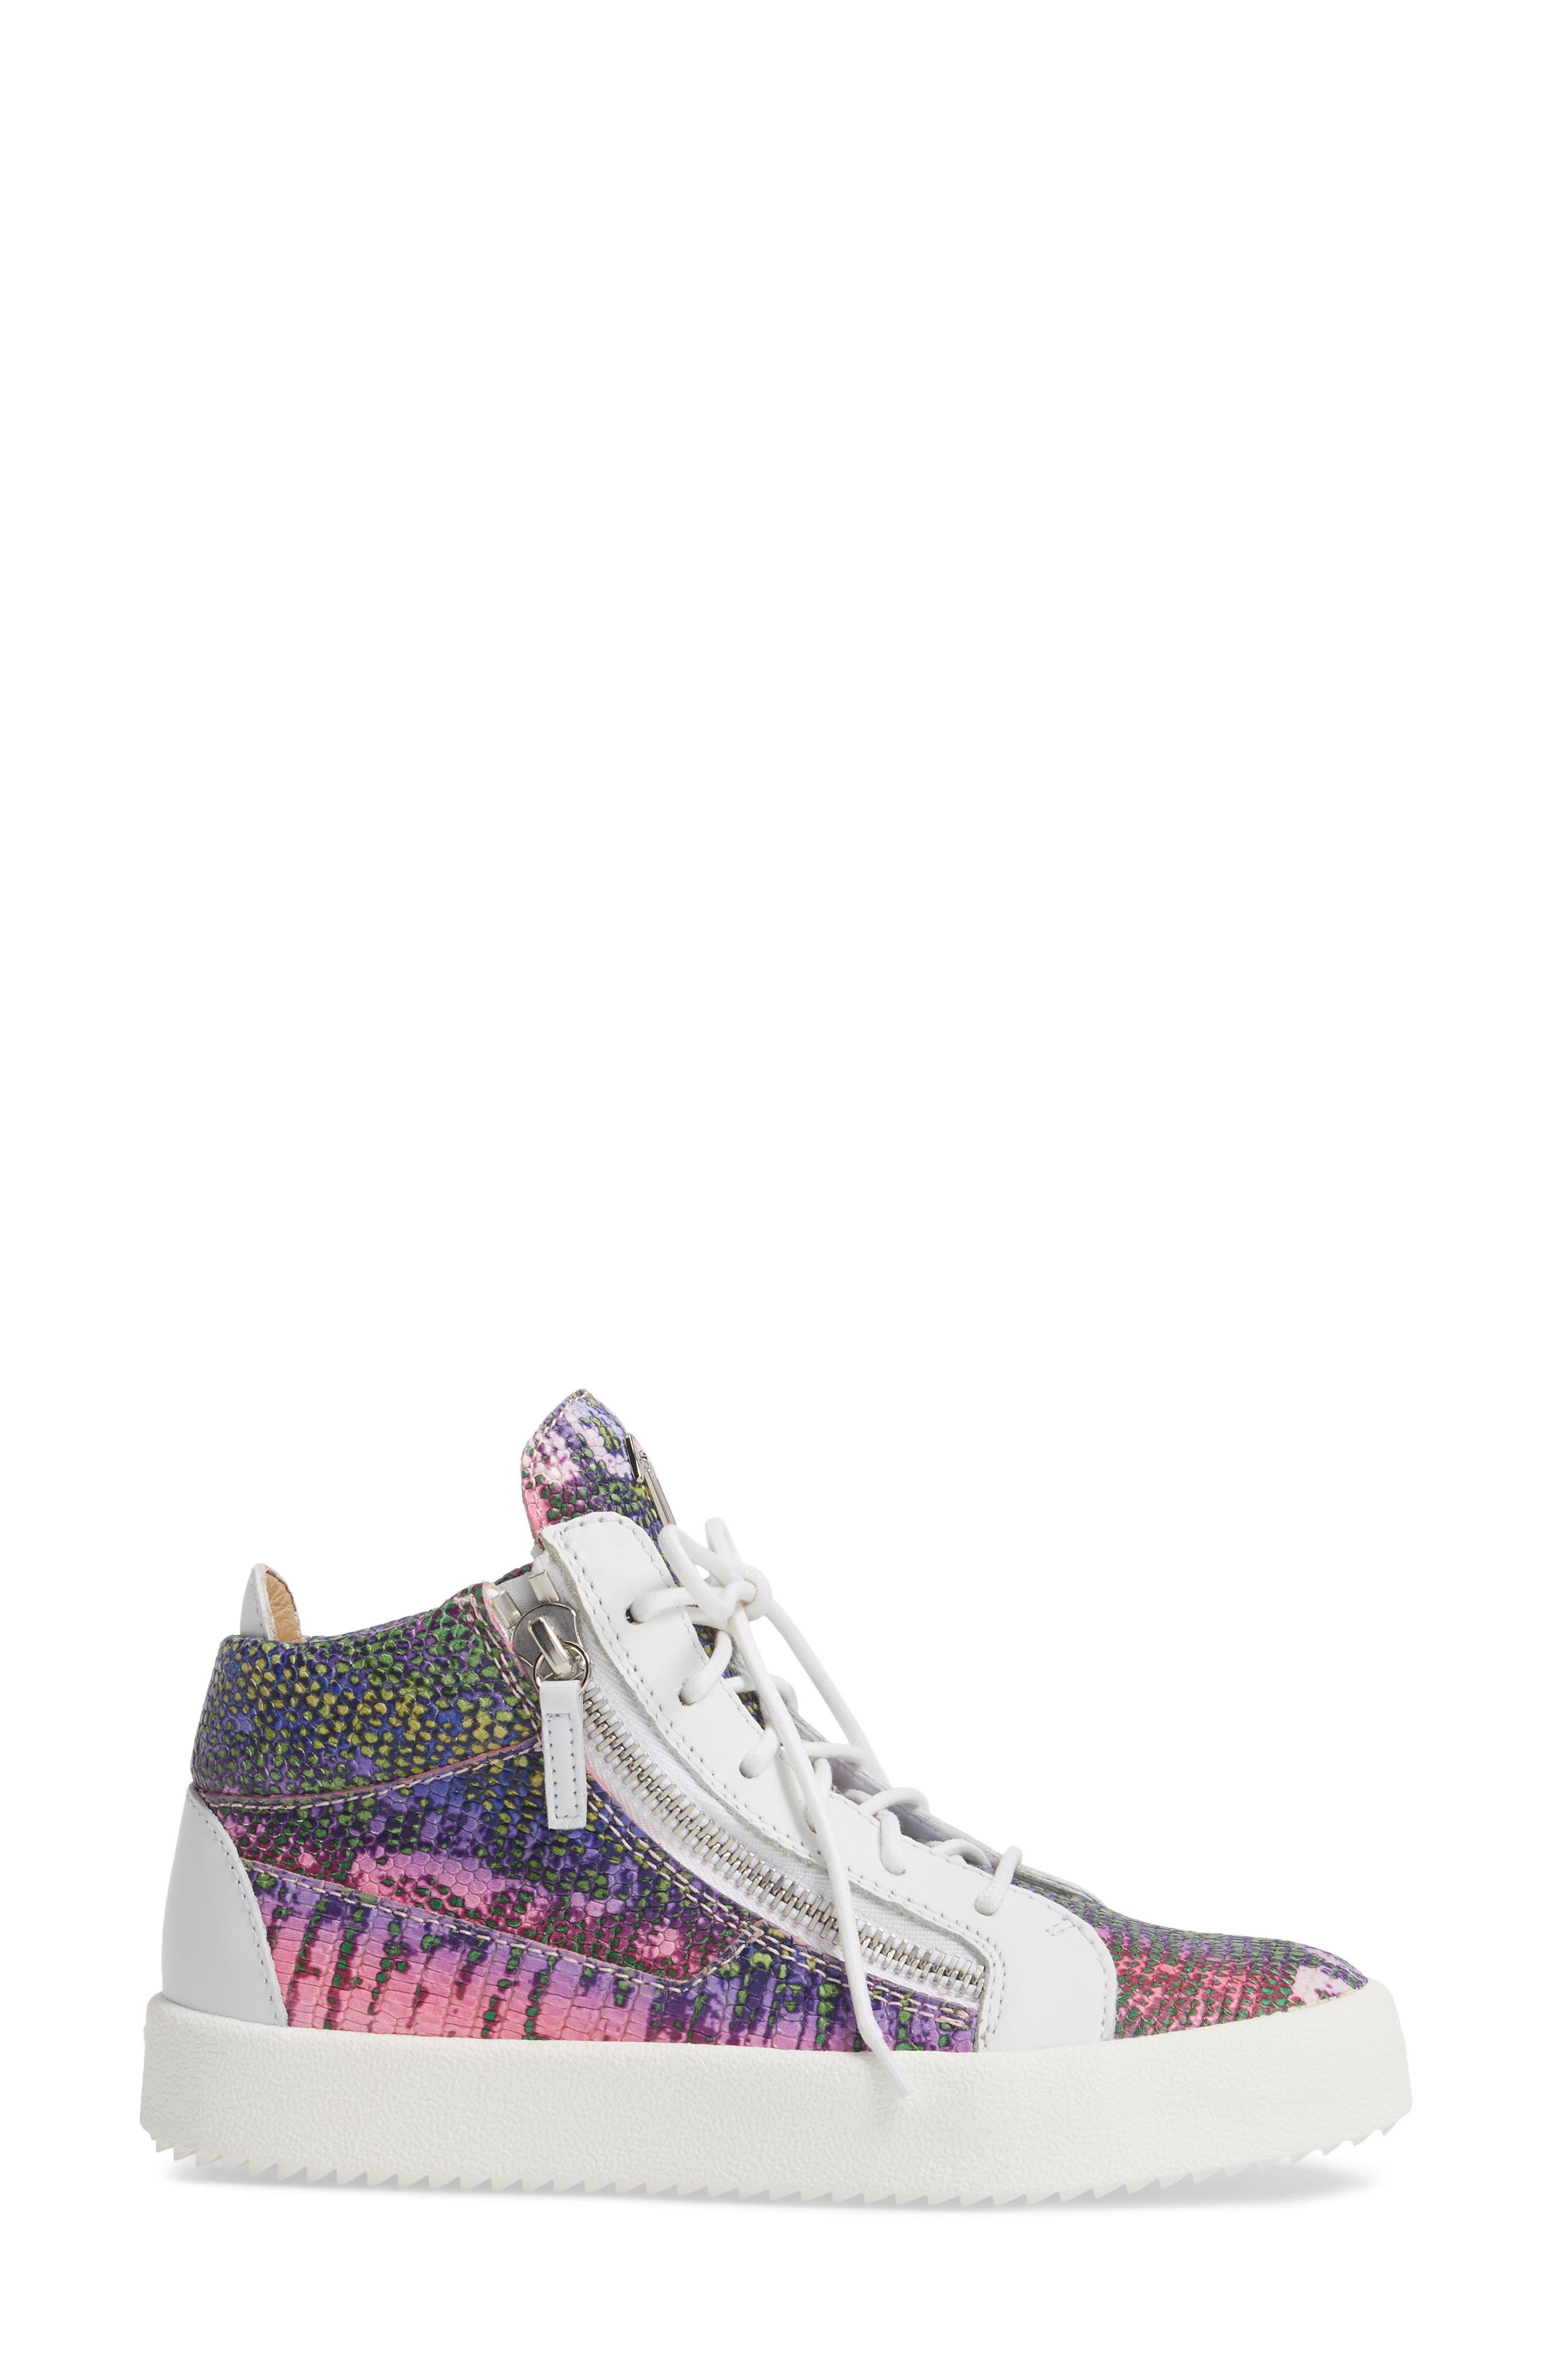 May London Mid Top Sneaker,                             Alternate thumbnail 3, color,                             PINK MULTI